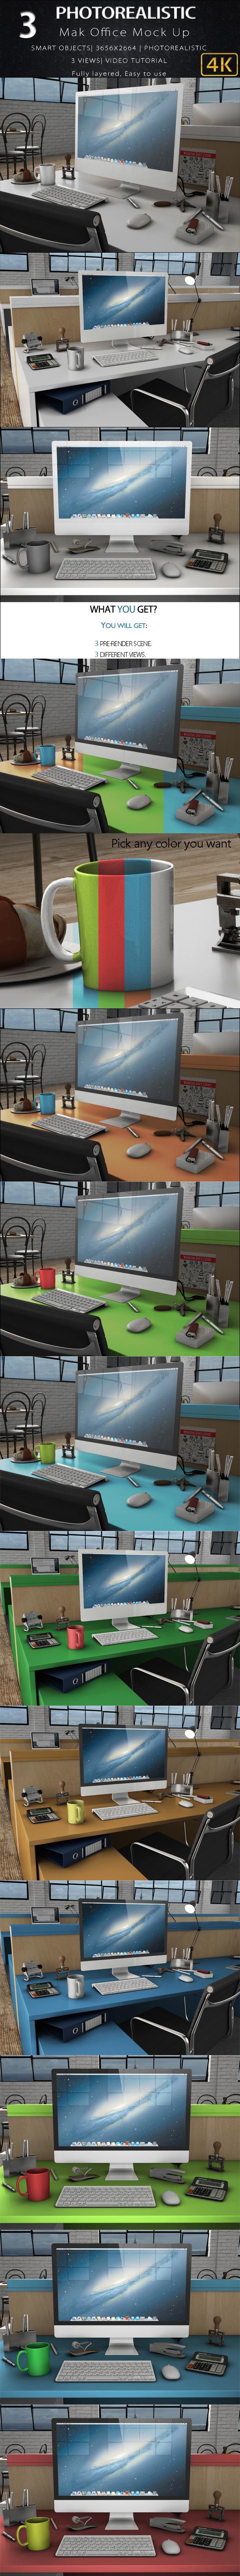 iMac-Office